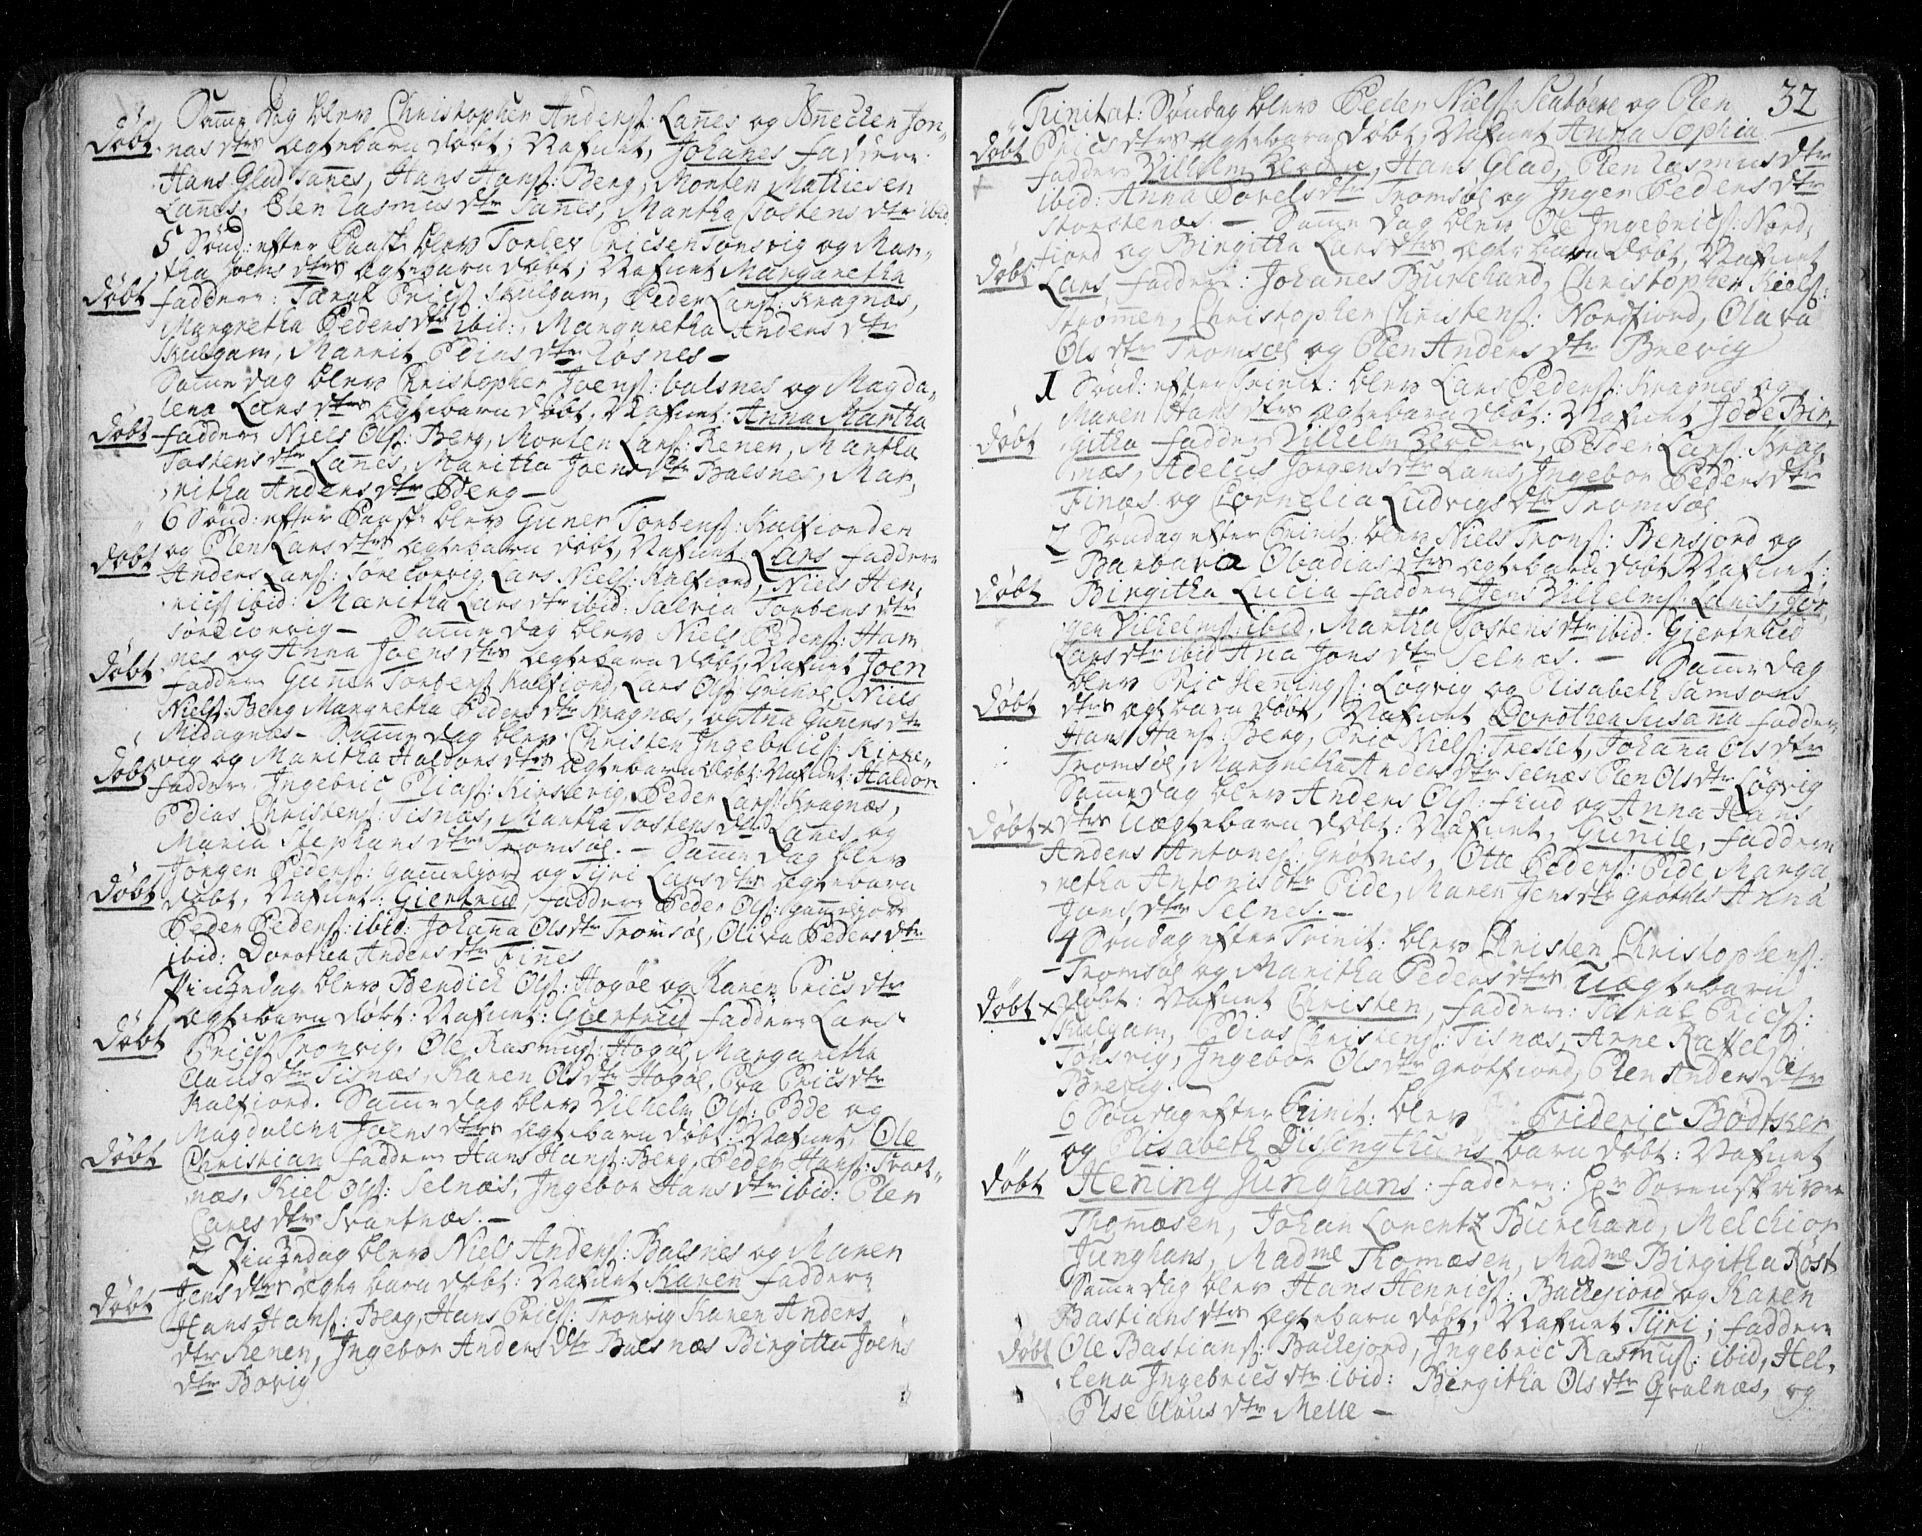 SATØ, Tromsø sokneprestkontor/stiftsprosti/domprosti, G/Ga/L0002kirke: Parish register (official) no. 2, 1753-1778, p. 32